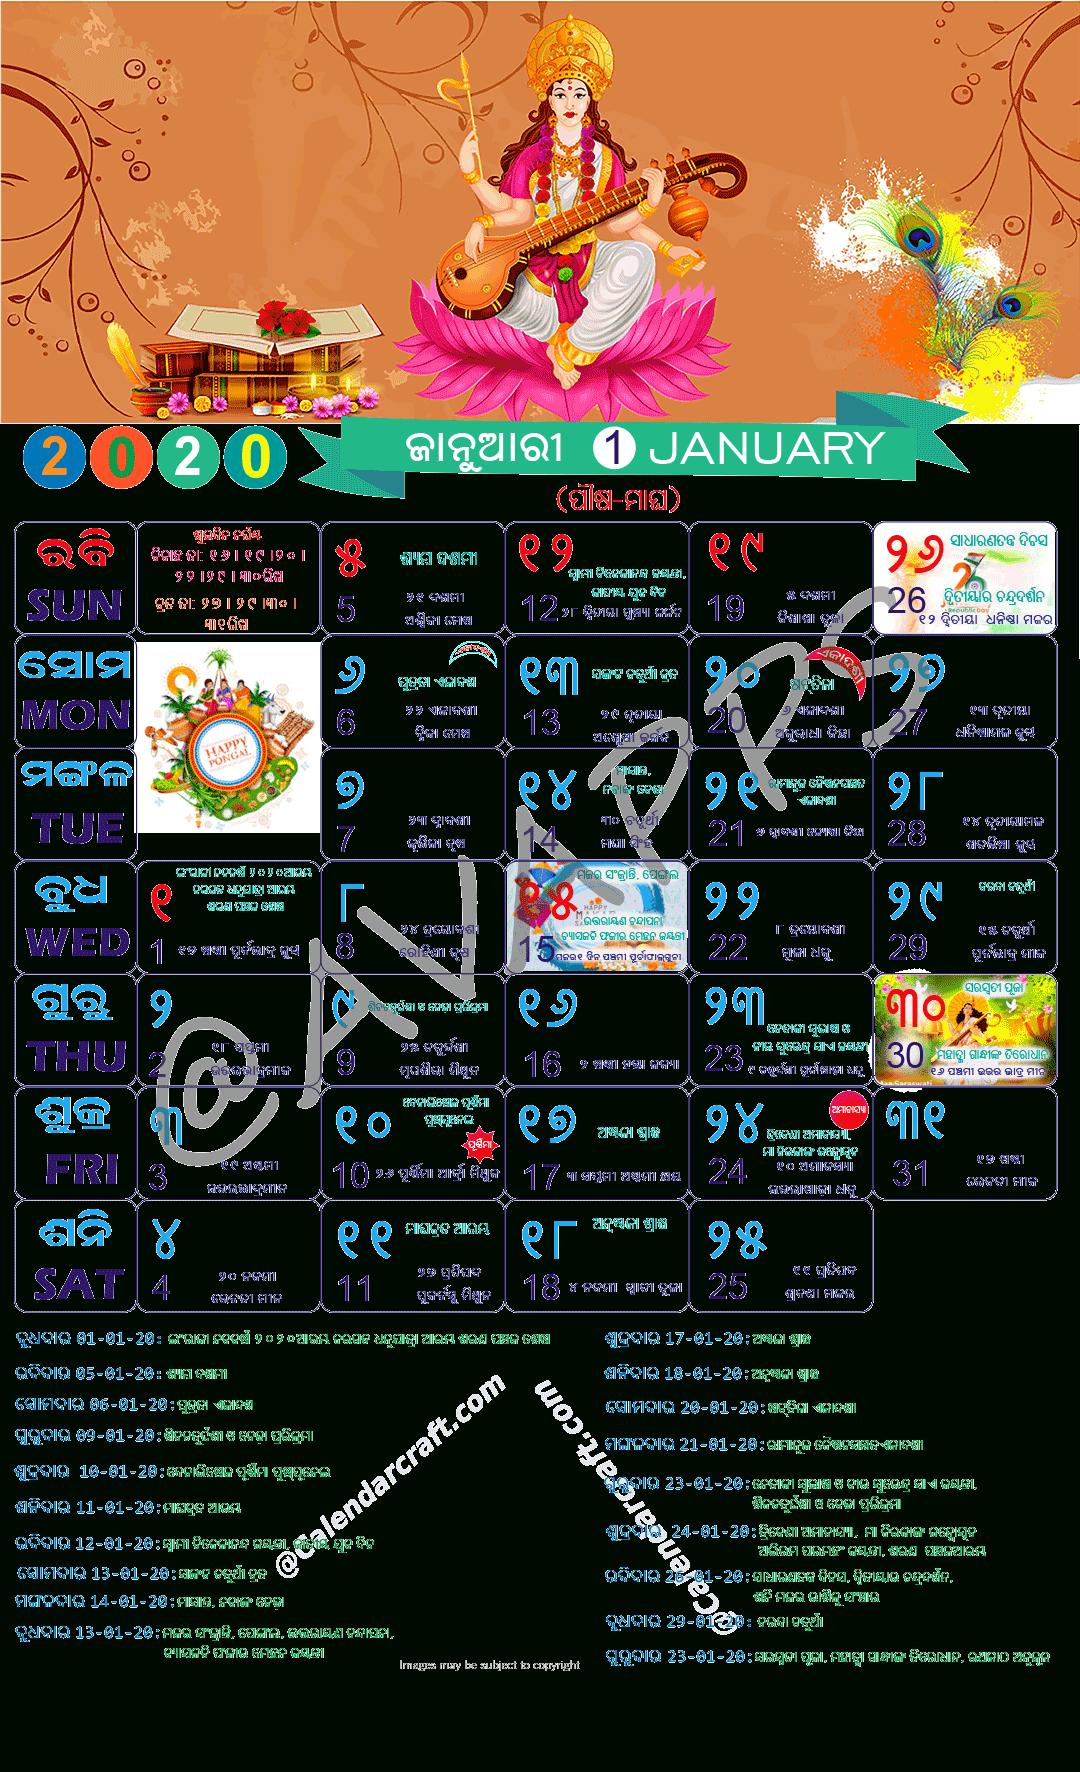 Odia Calendar January 2020 | Mobile Apps regarding Odia Calendar January 2020